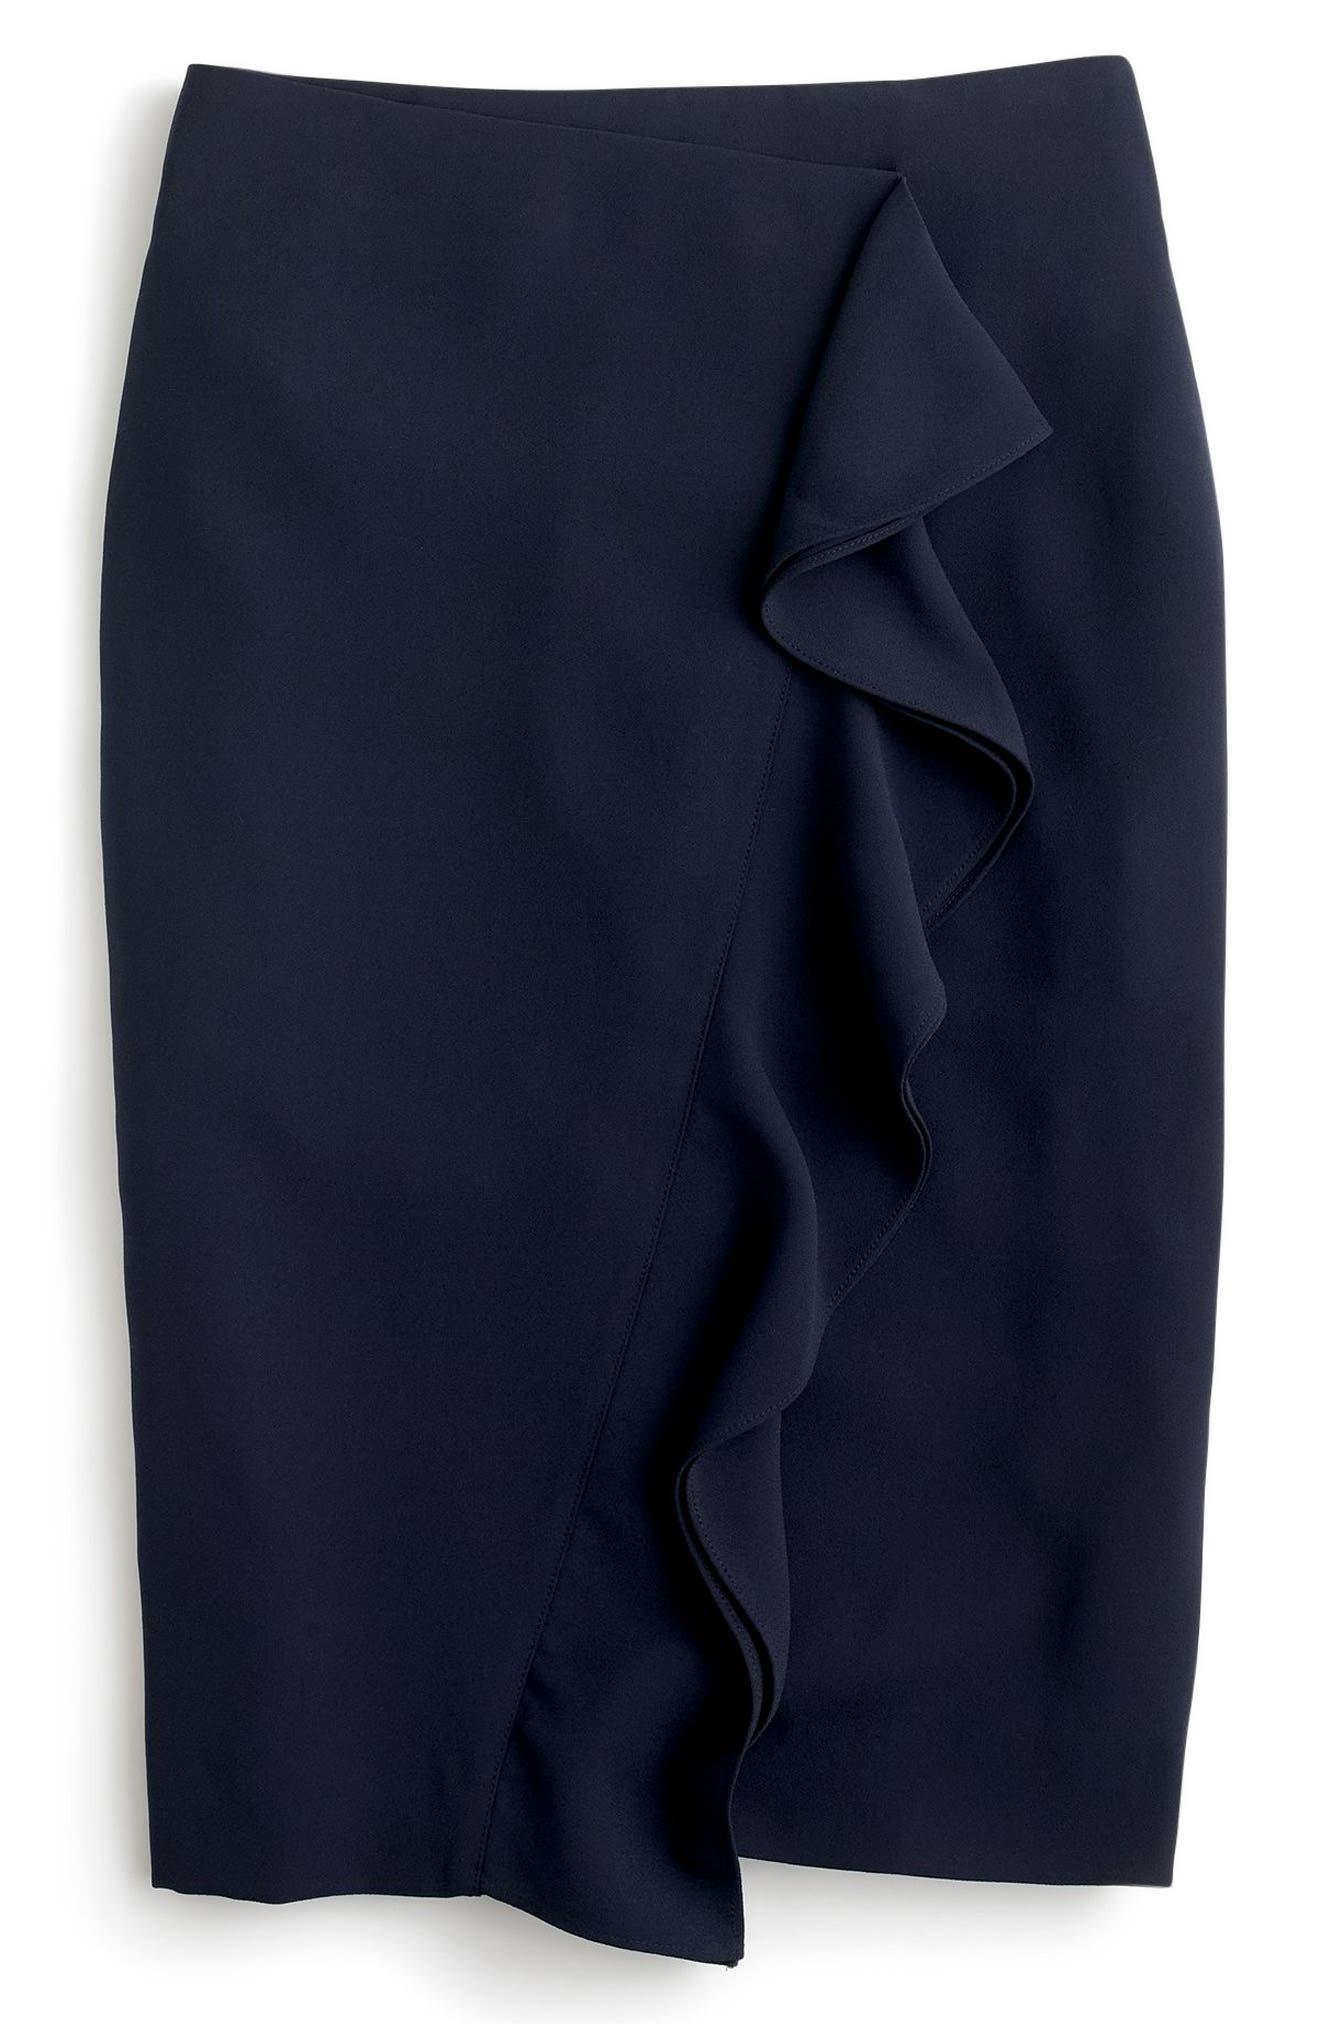 J.Crew 365 Crepe Ruffle Pencil Skirt,                             Alternate thumbnail 5, color,                             Navy